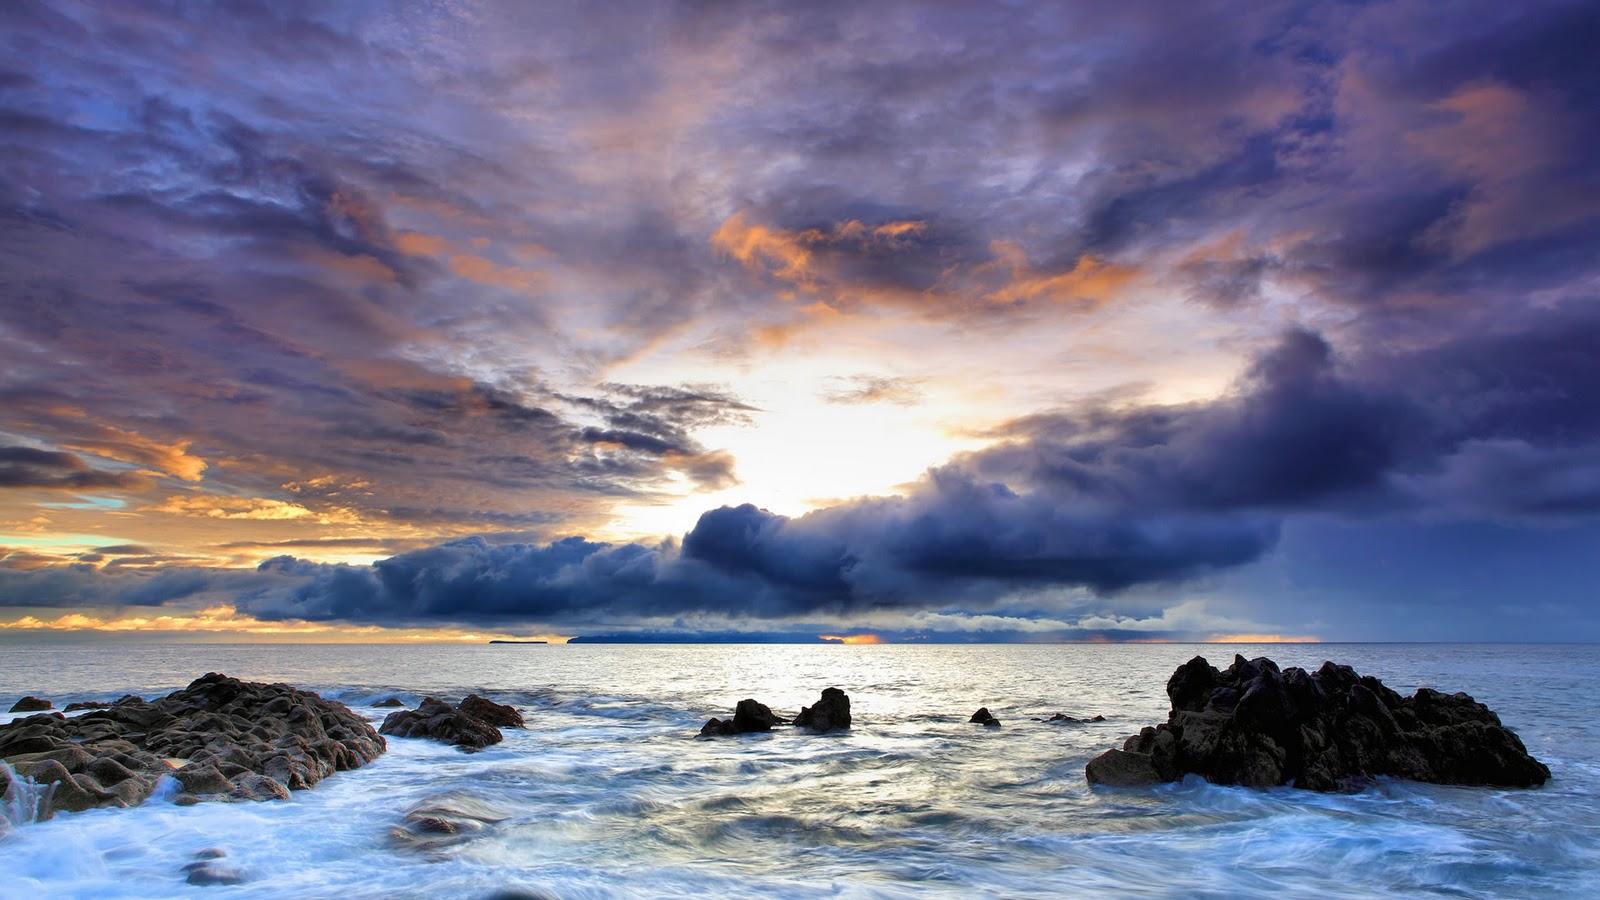 http://4.bp.blogspot.com/_8syJggjkpmE/TOzRew2OuNI/AAAAAAAAACw/fBXX6vLvms0/s1600/wallpaper-of-scenery-1920x1080-1009106.jpg